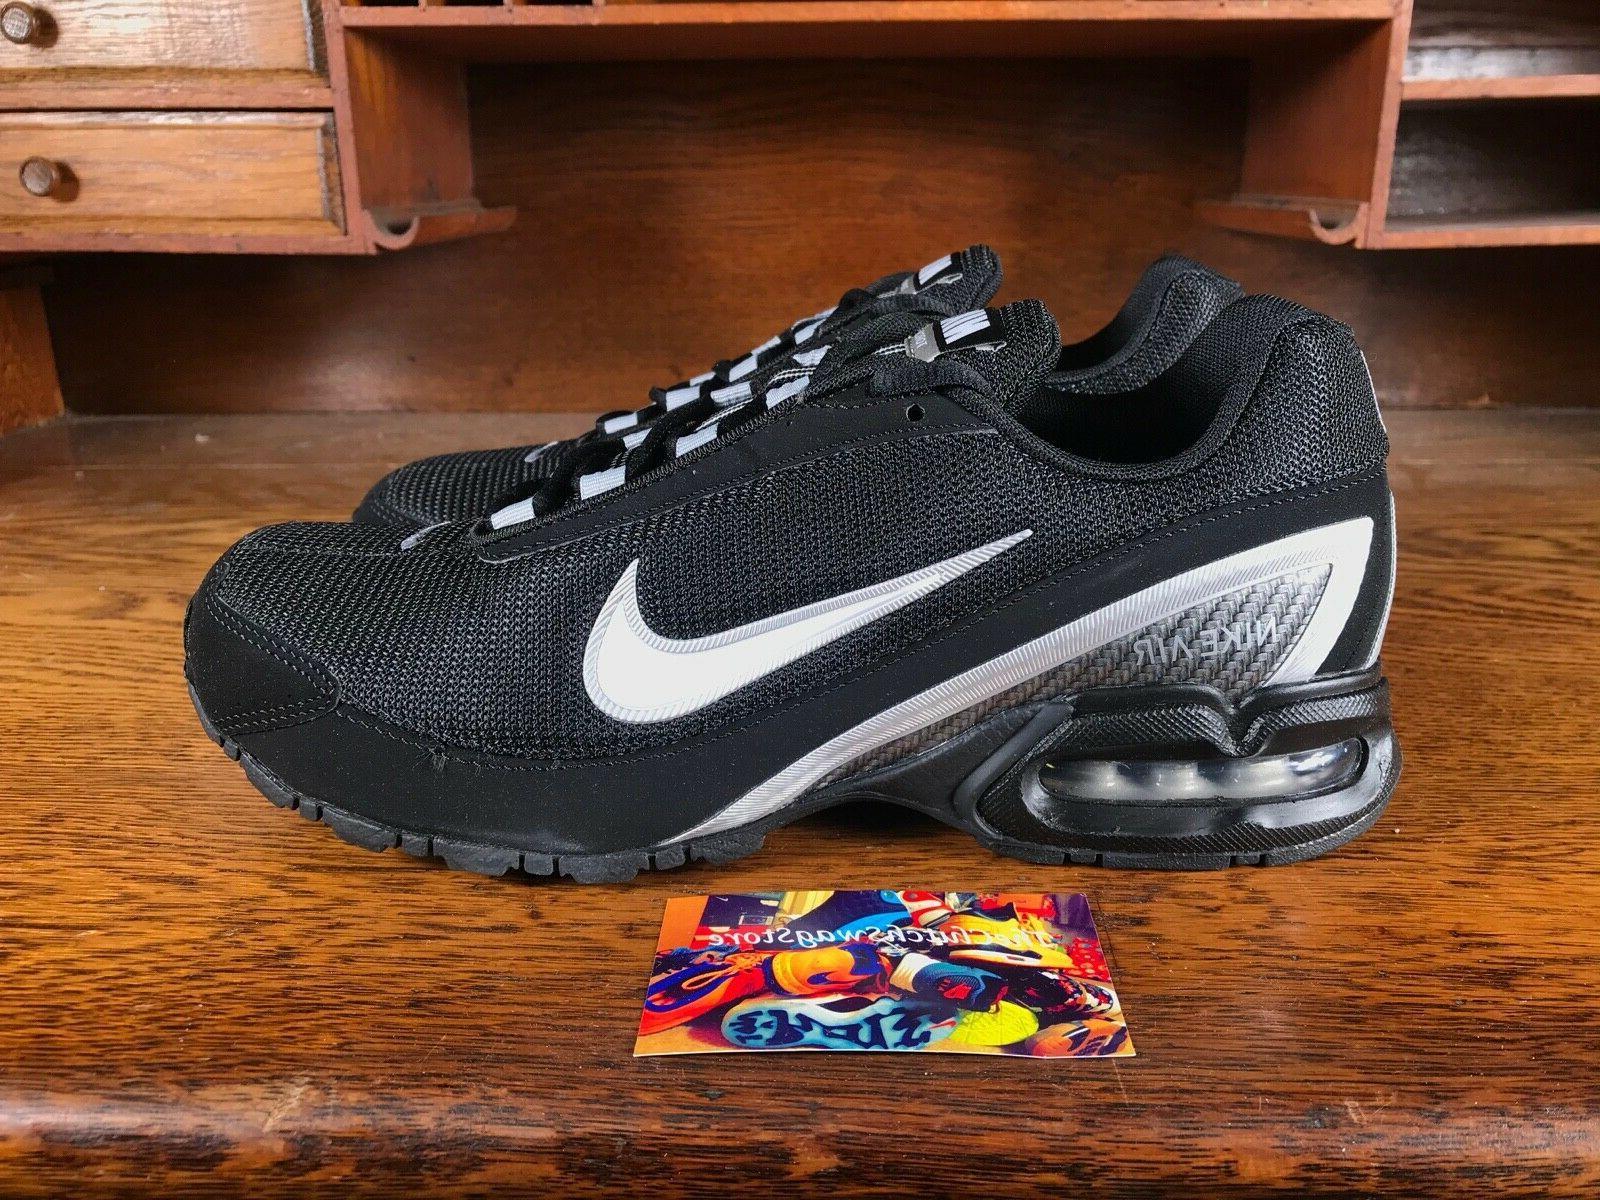 Nike 3 Mens Running Shoes Black/White